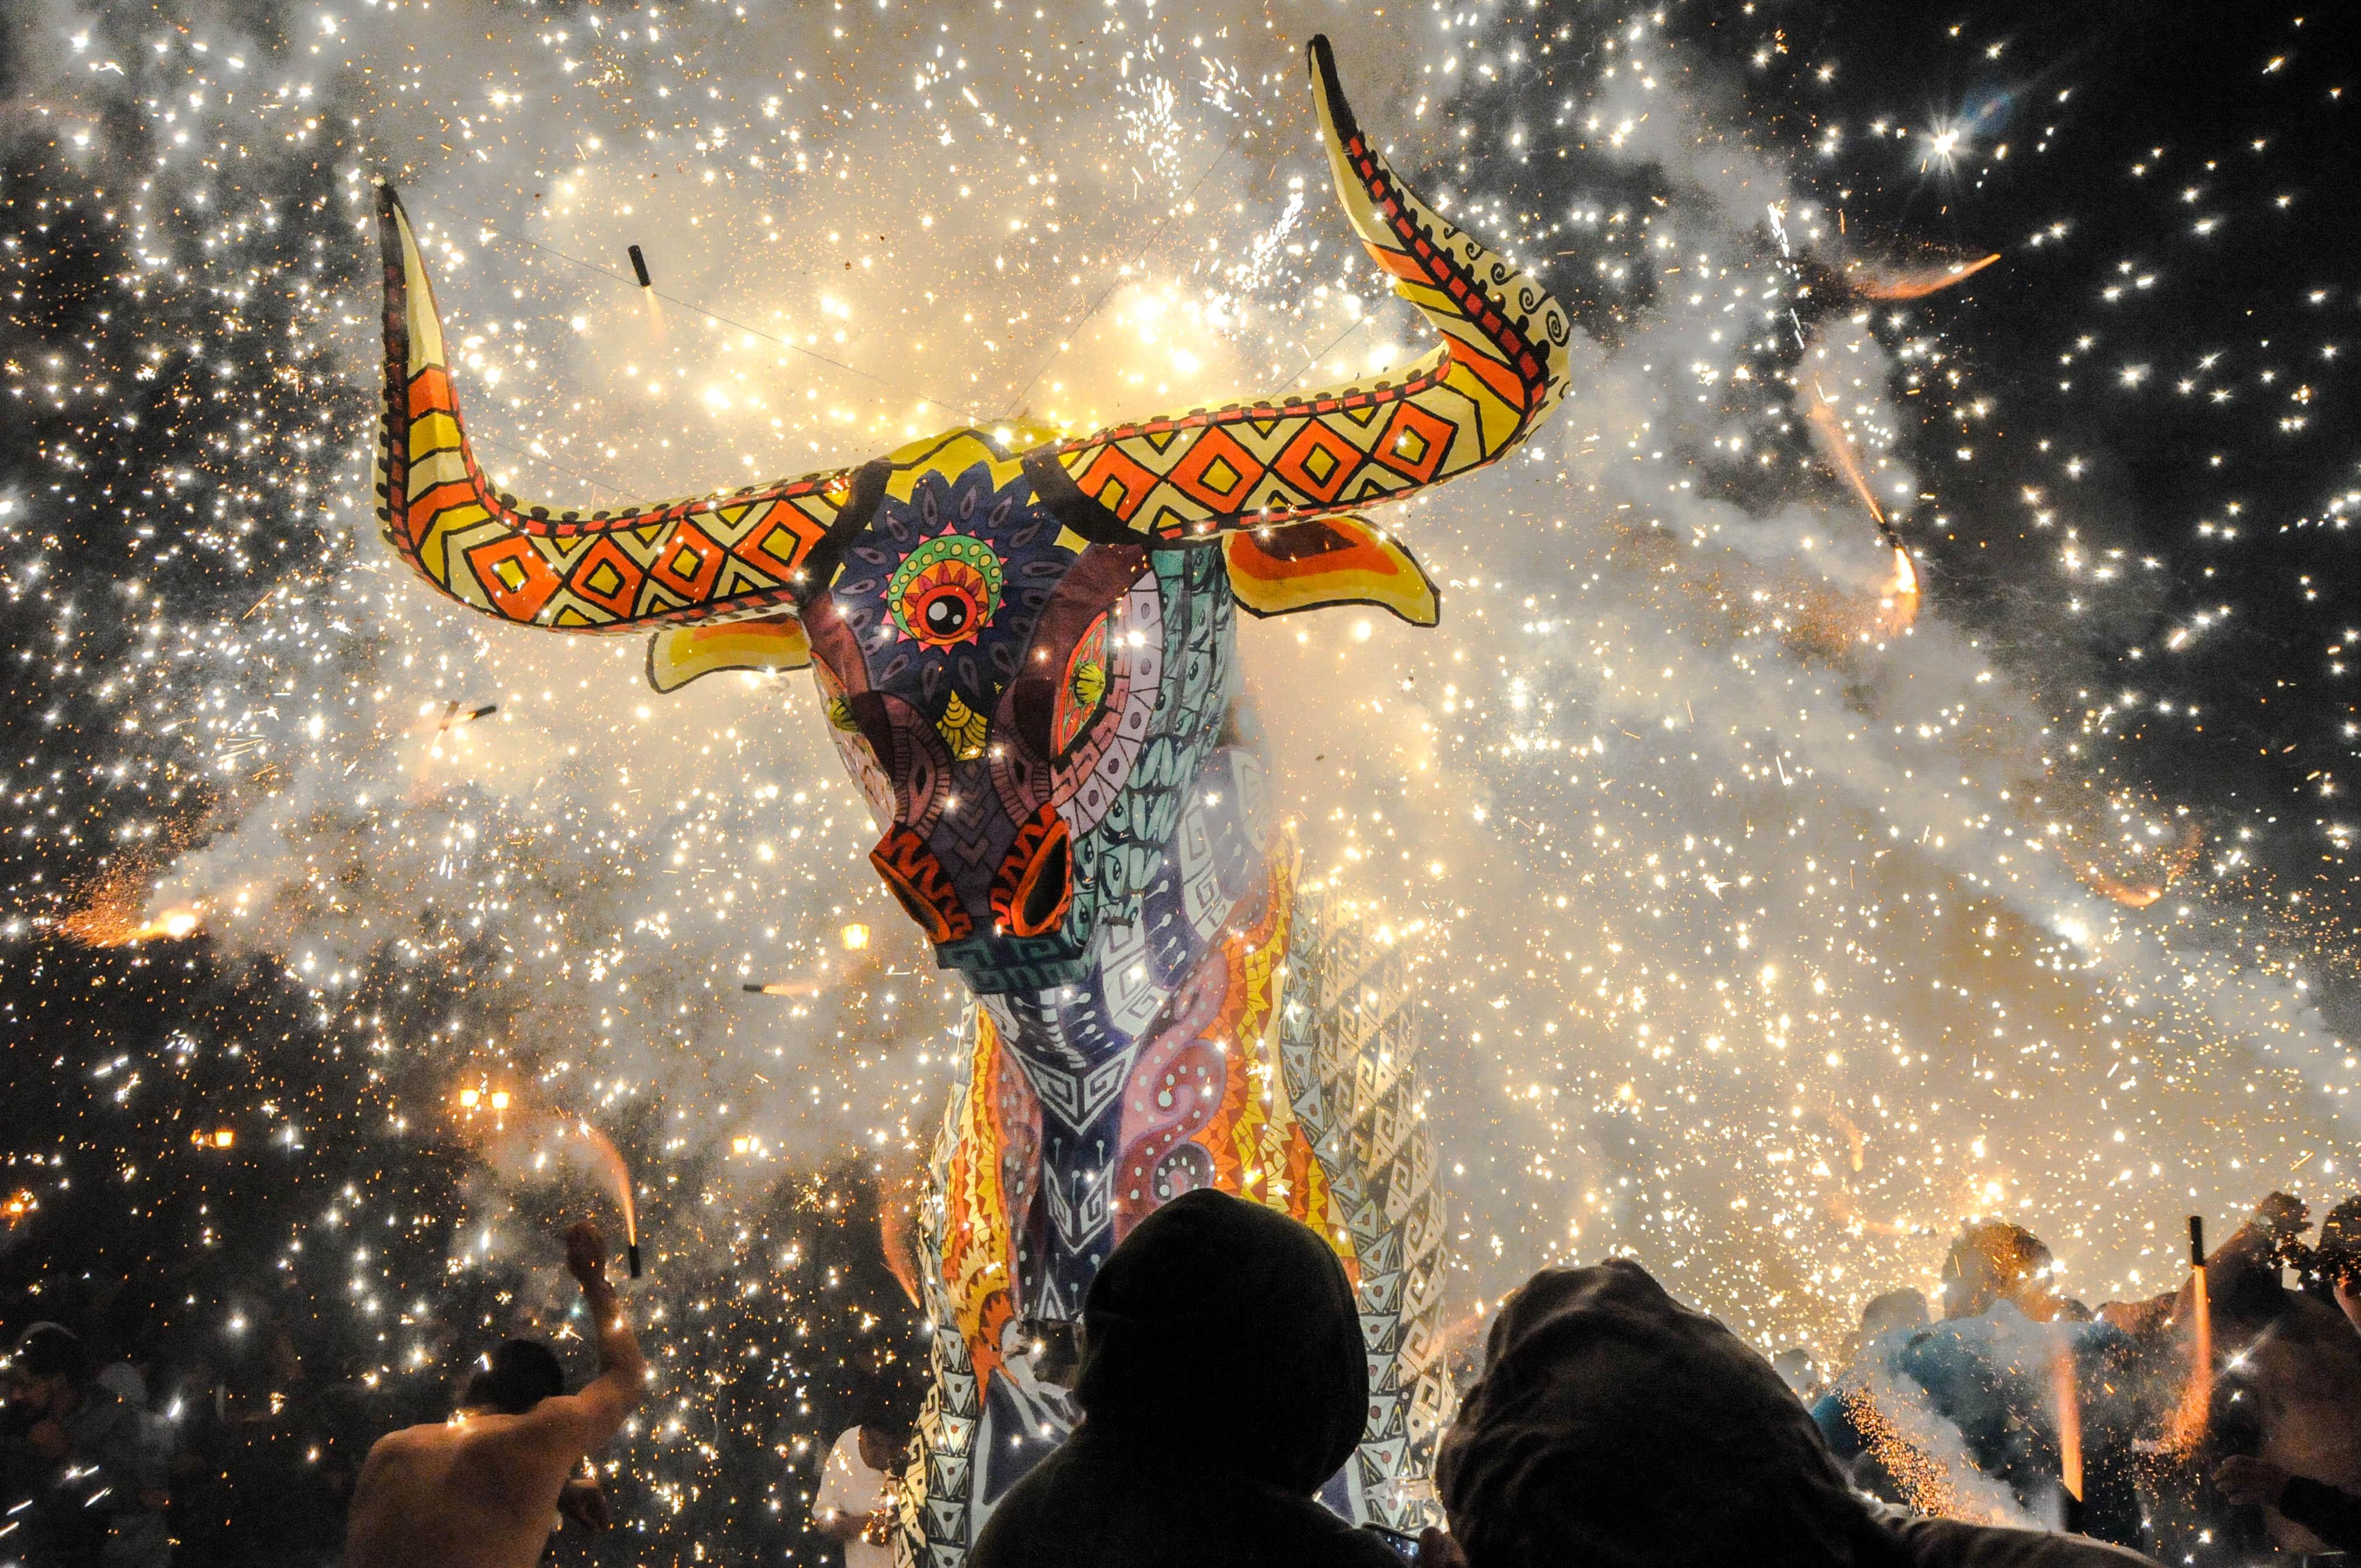 la-feria-de-la-pirotecnia-tultepec-2019-viene-con-todo